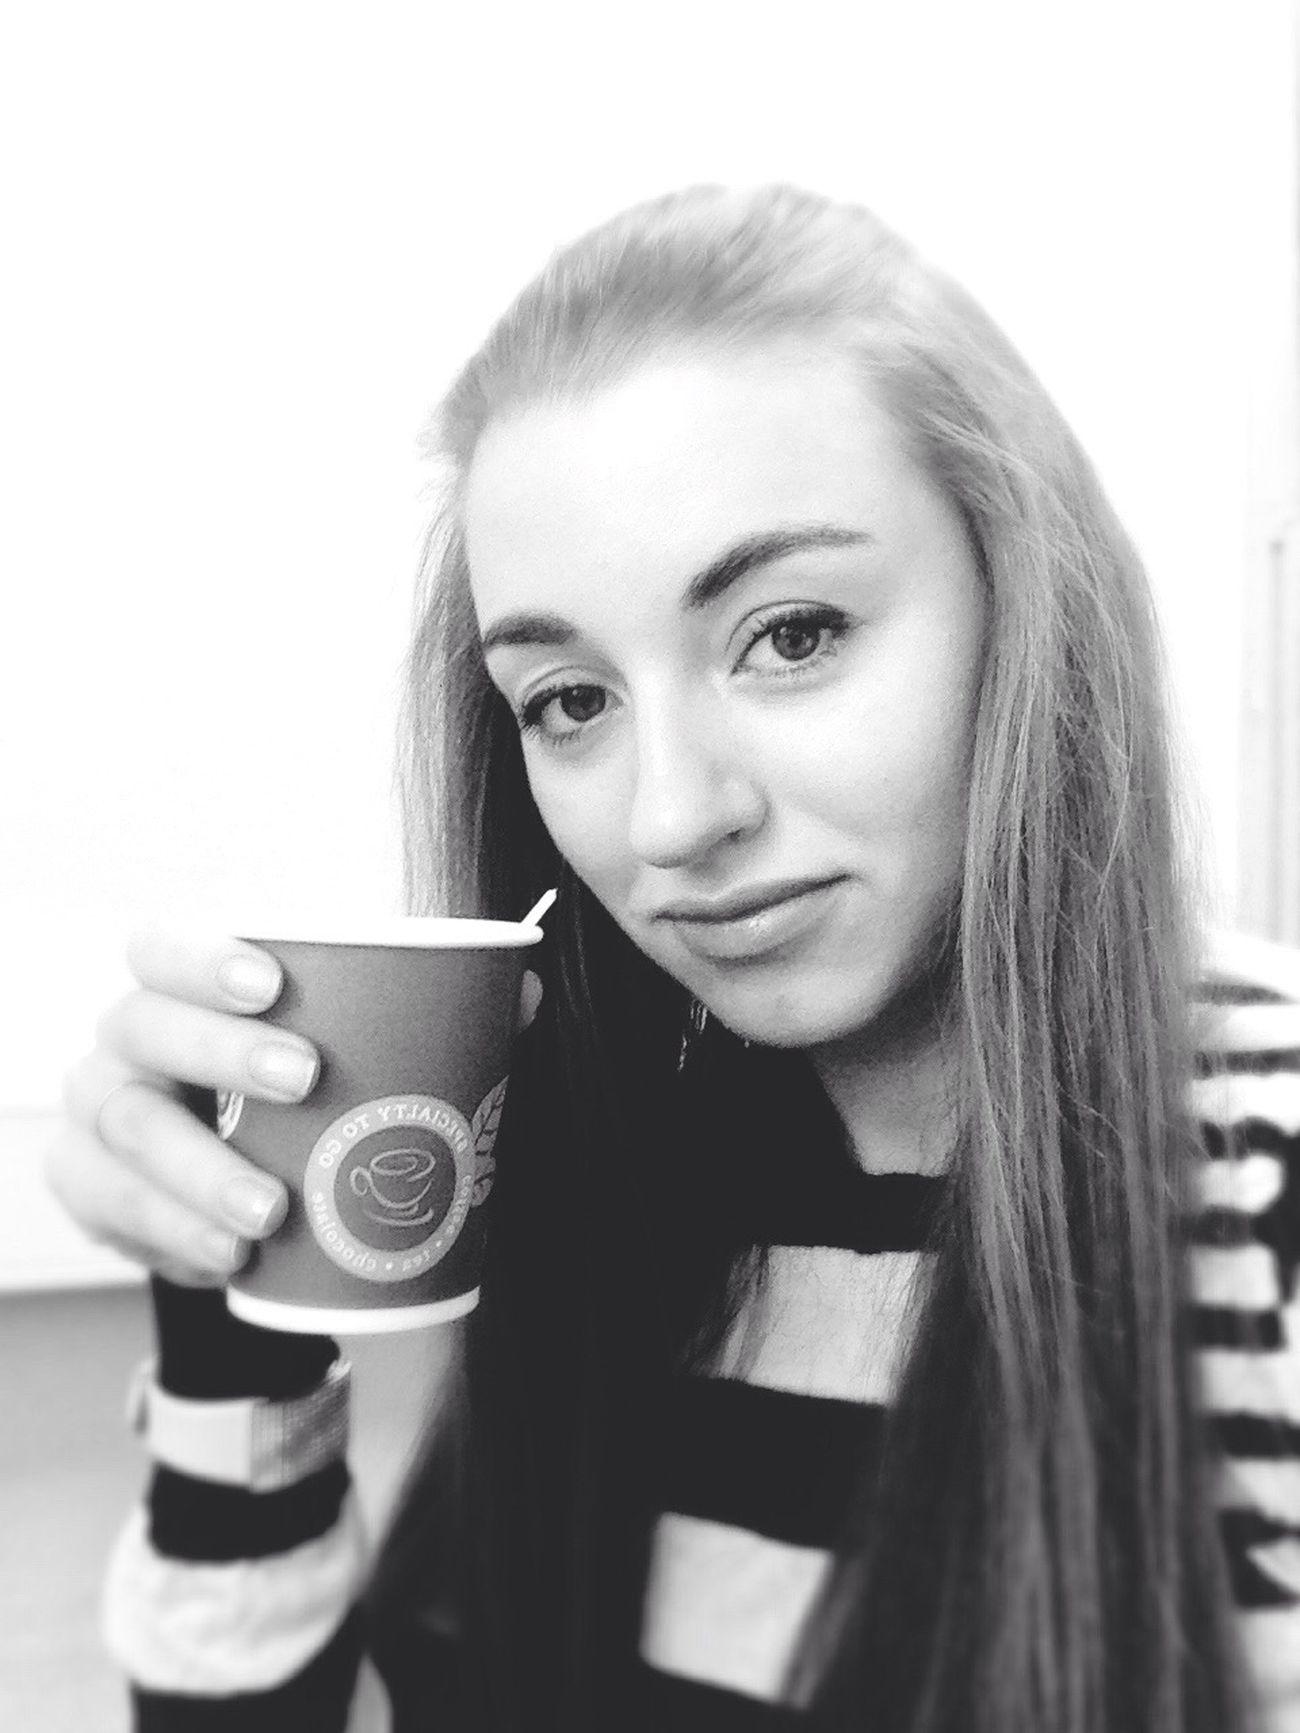 Coffee Girl Morning Msk